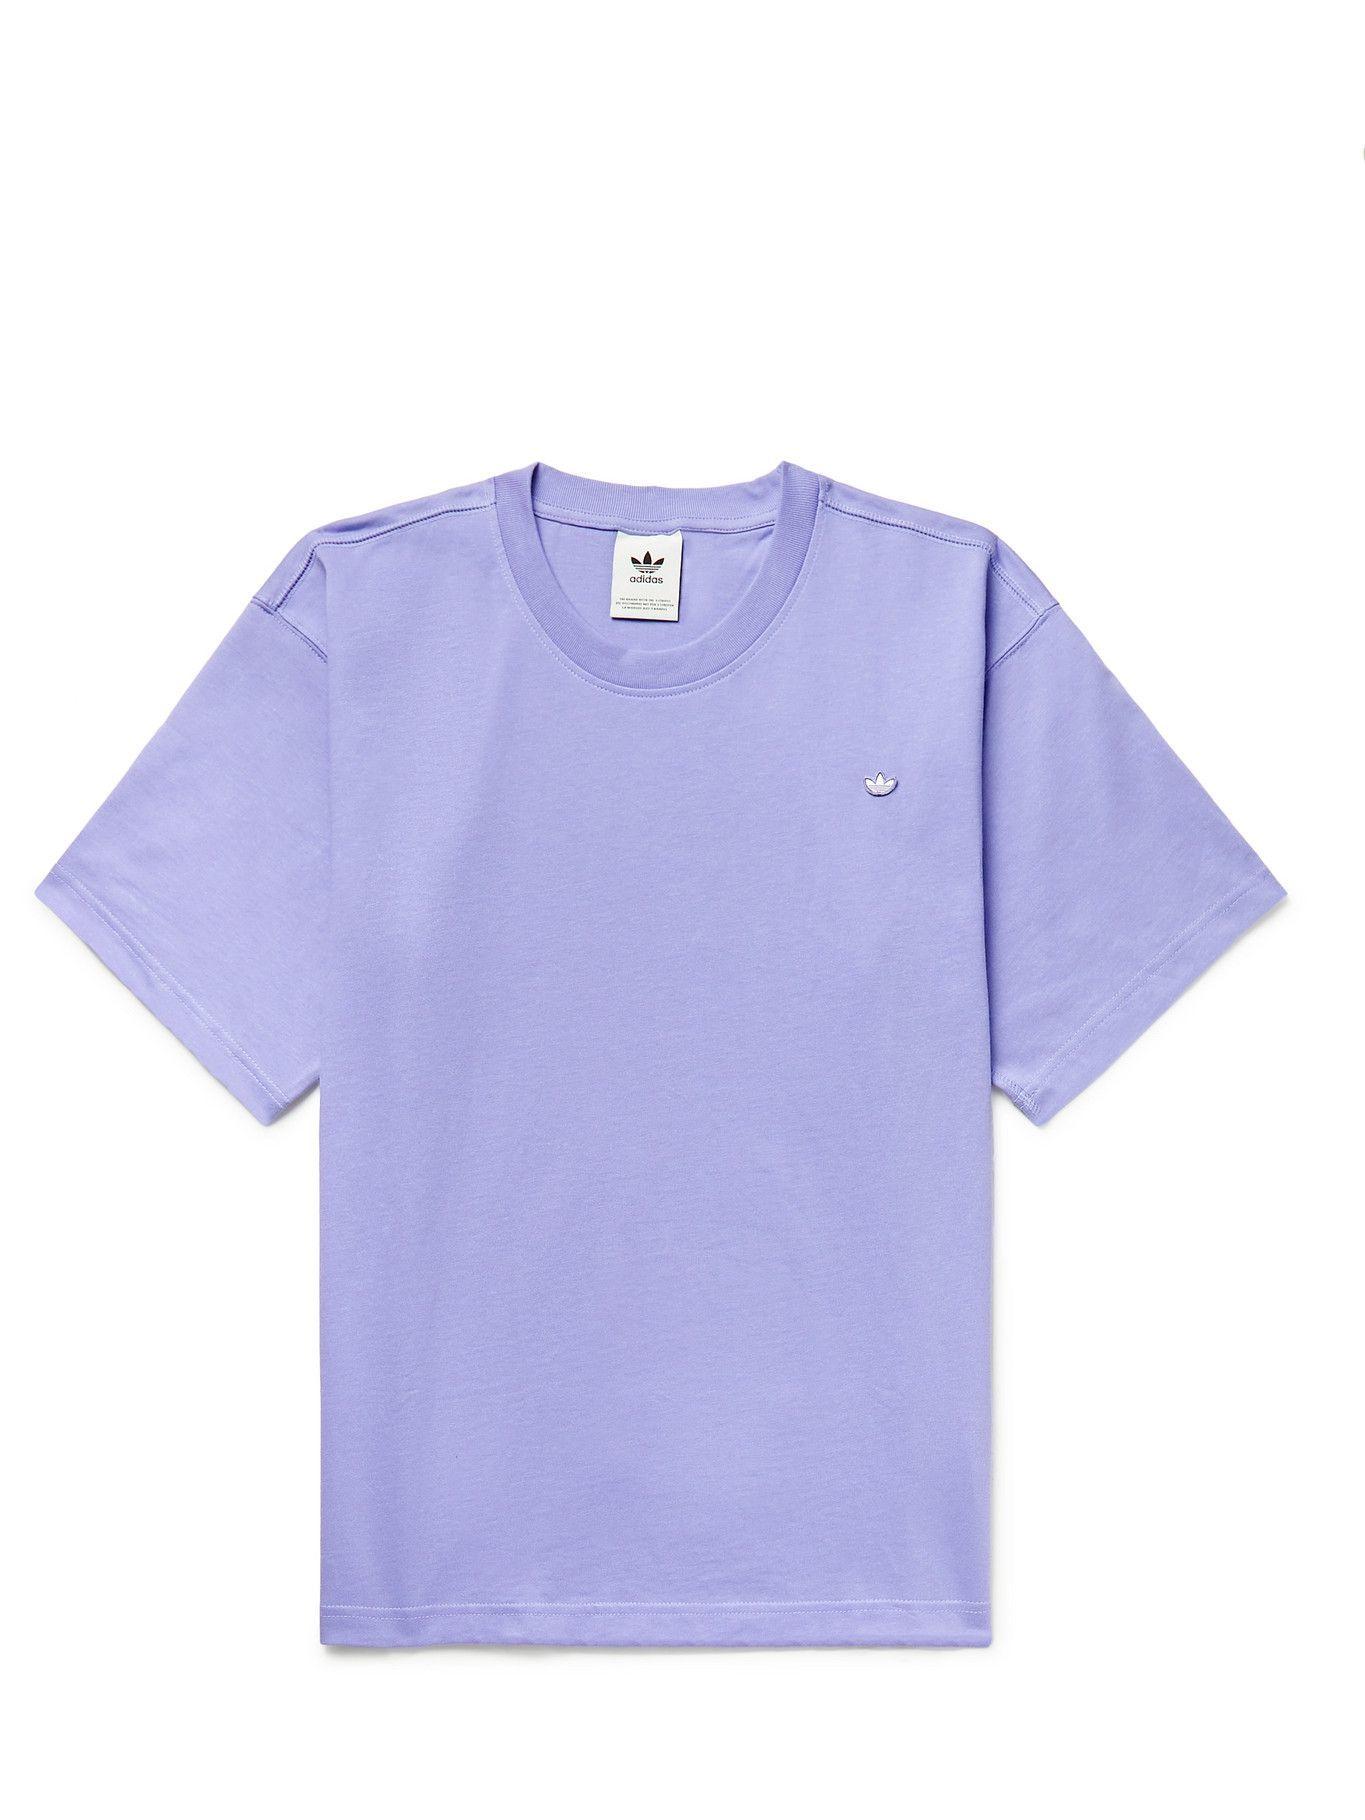 Photo: ADIDAS ORIGINALS - Adicolor Logo-Appliquéd Organic Cotton-Jersey T-Shirt - Purple